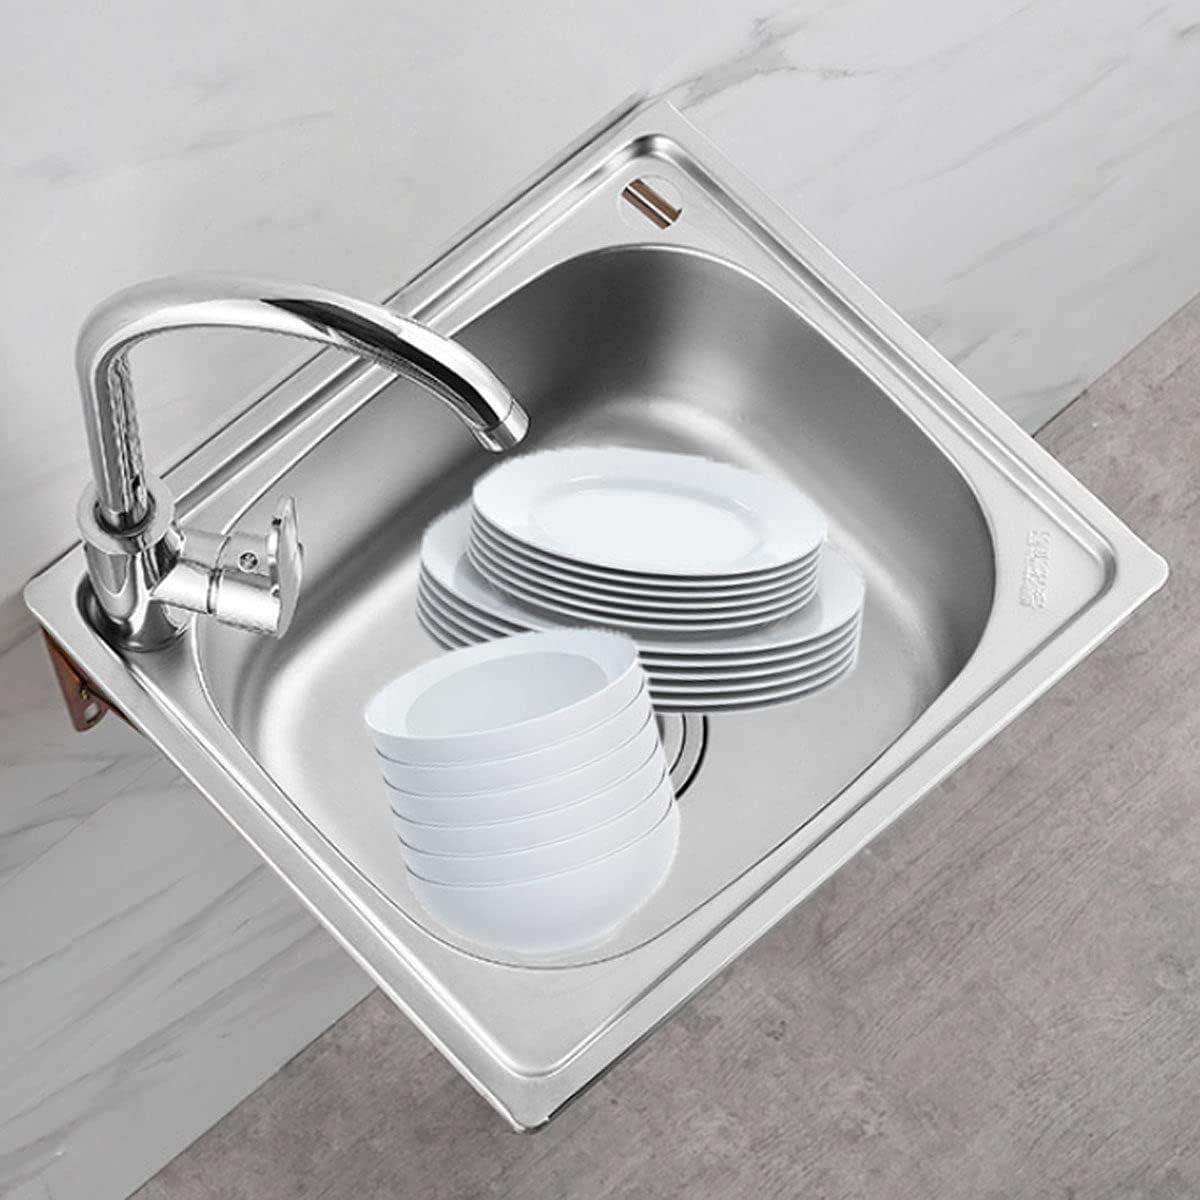 WZFANJIJ Kitchen Sink Handmade Popular shop is the lowest price challenge Undermount shopping Si Bowl Single